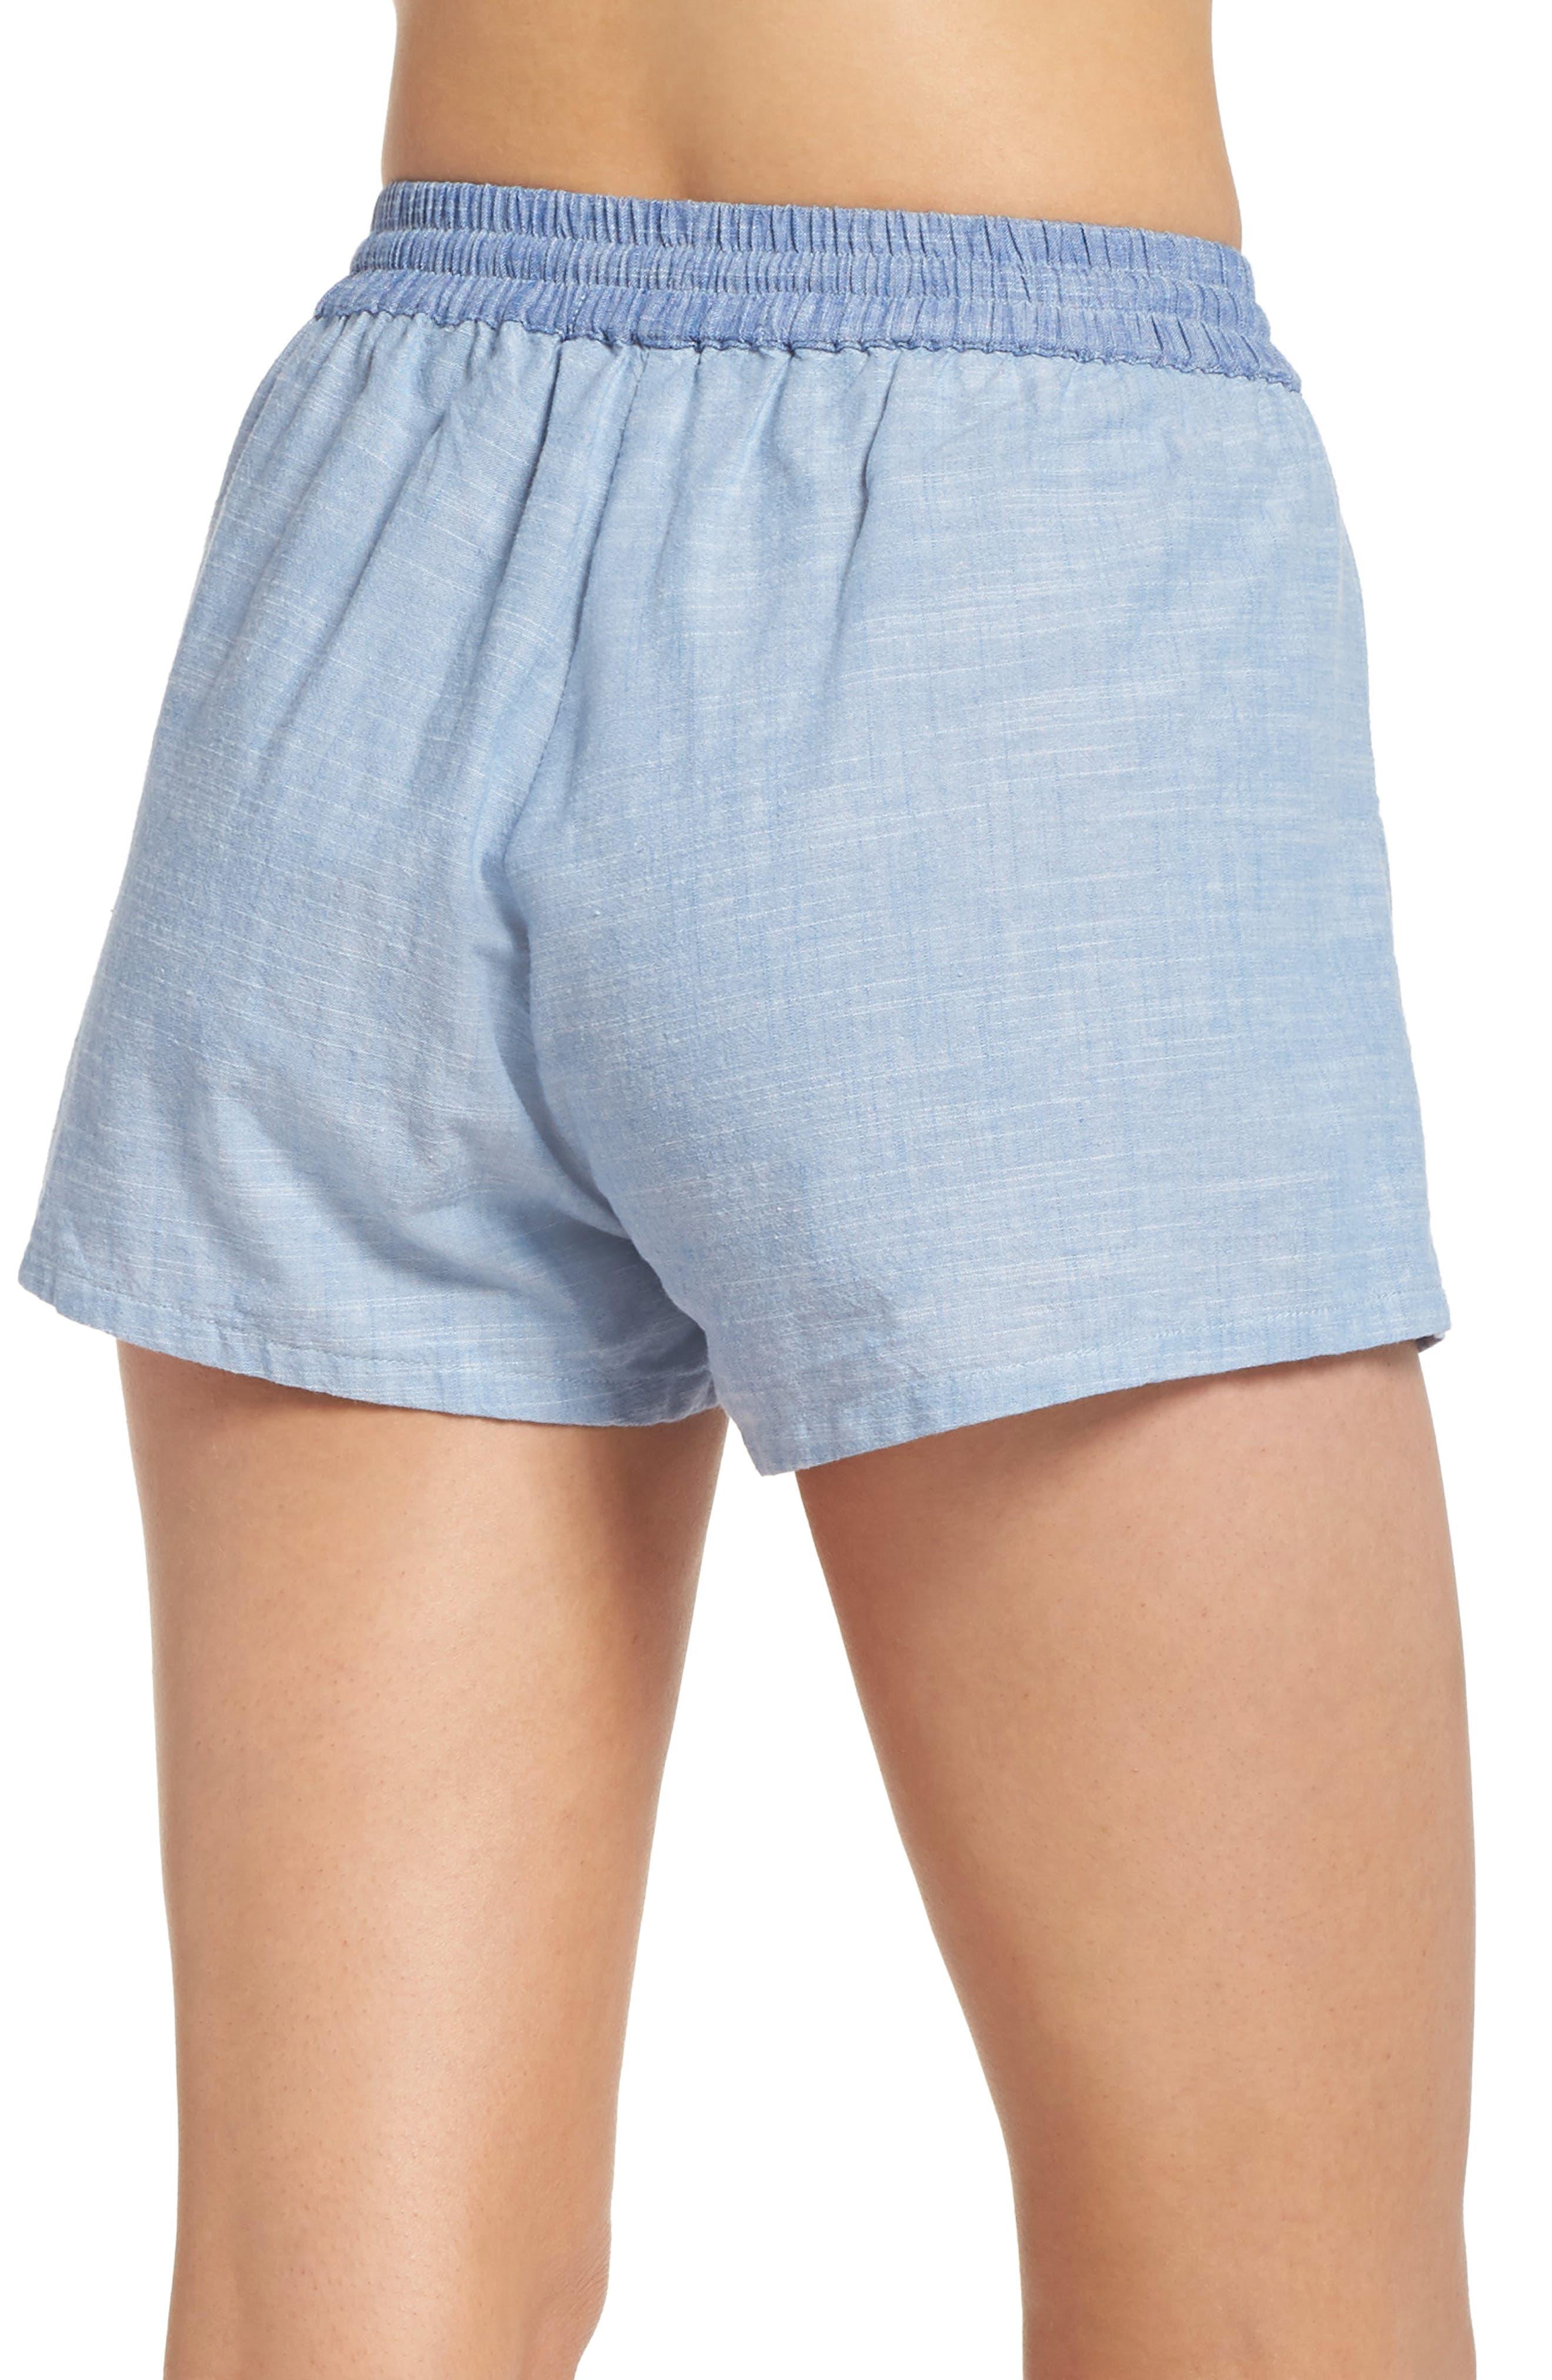 Jude Pajama Shorts,                             Alternate thumbnail 2, color,                             458